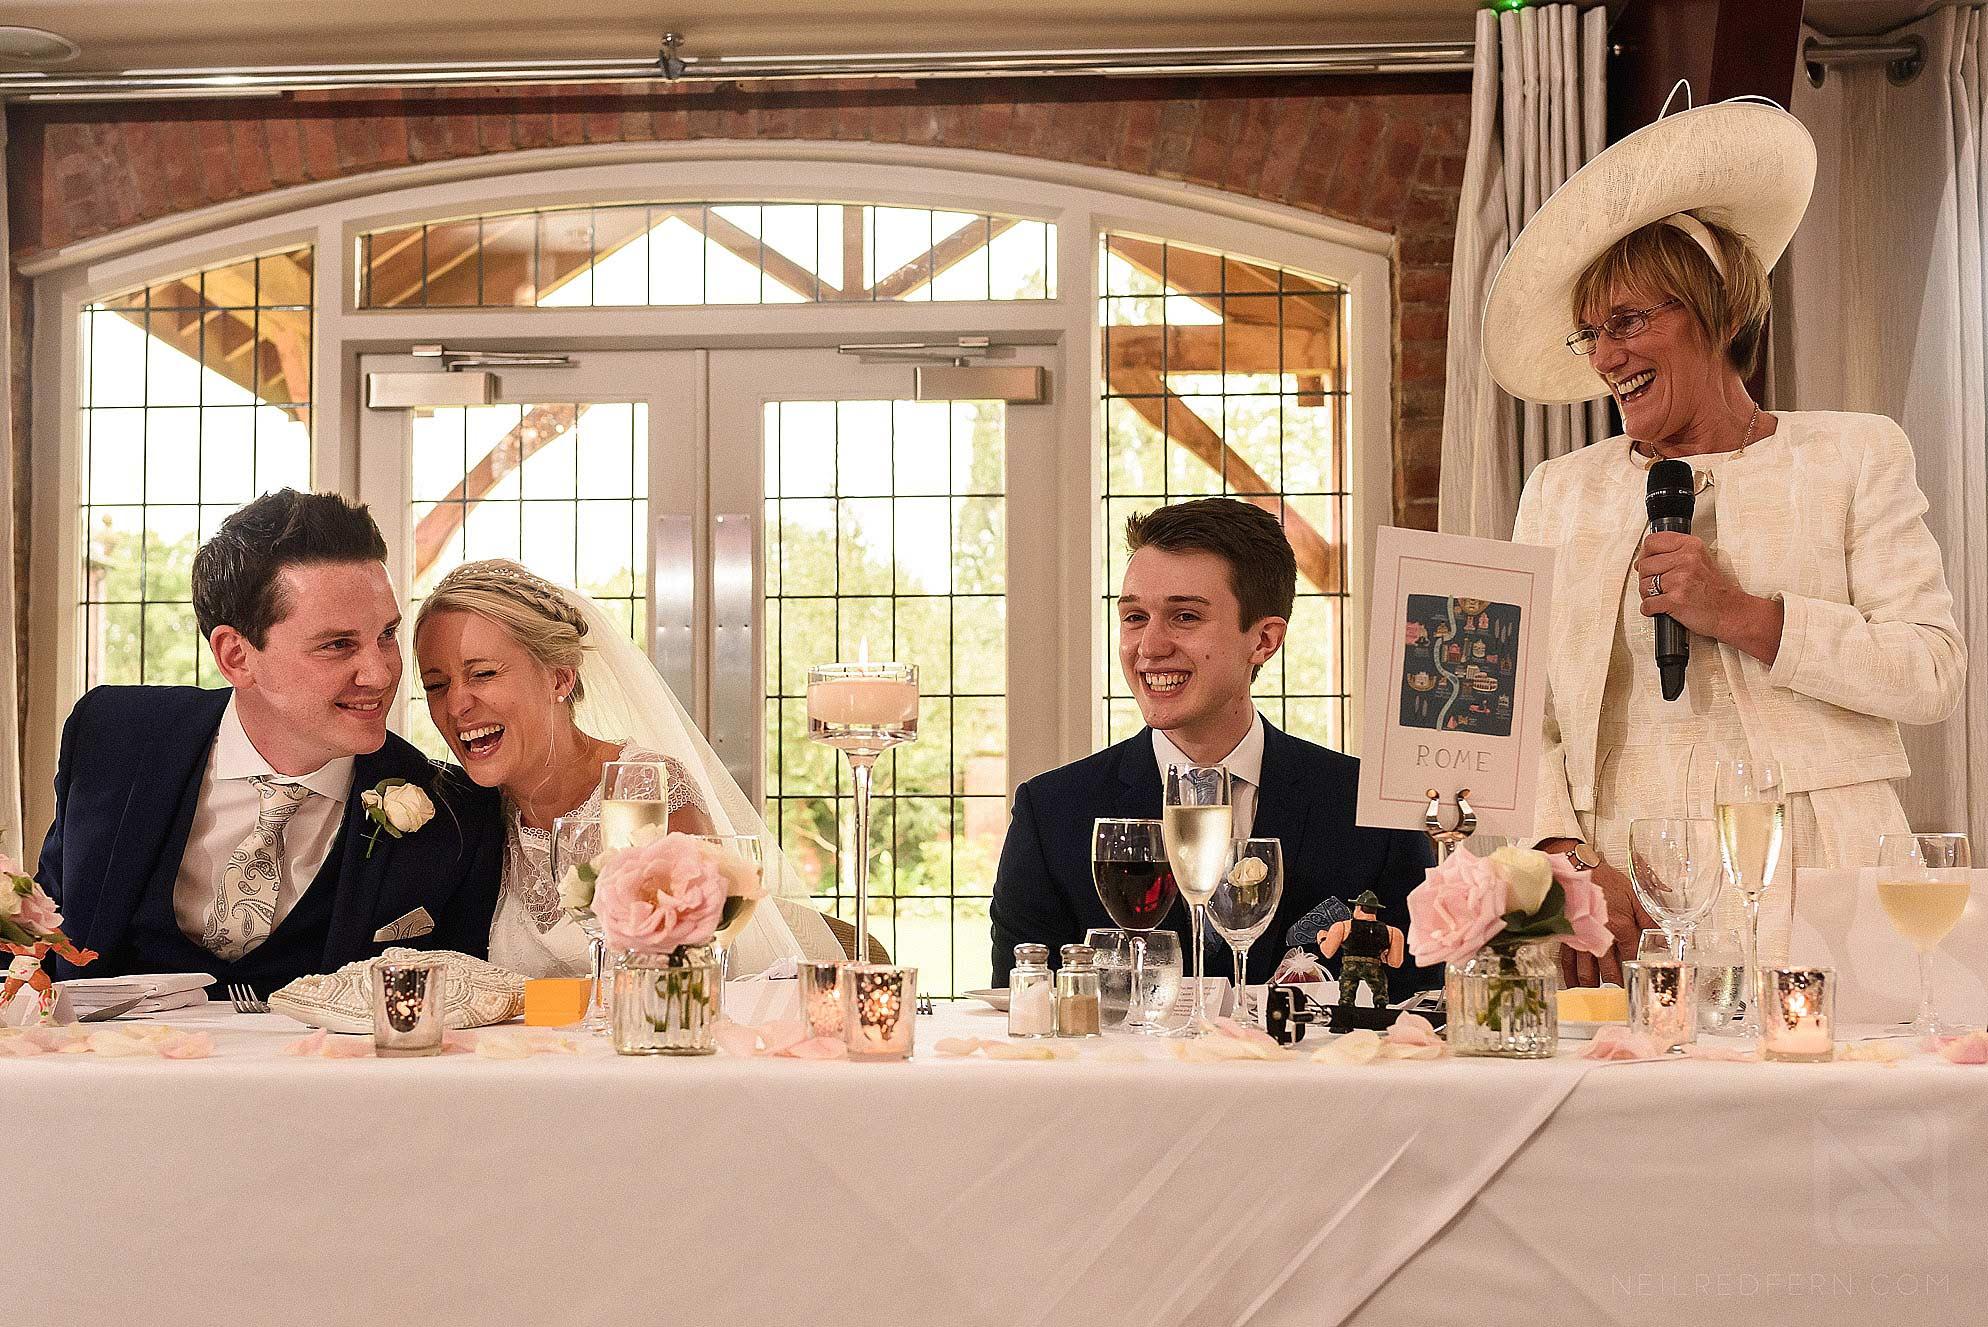 colshaw-hall-wedding-photographs-24